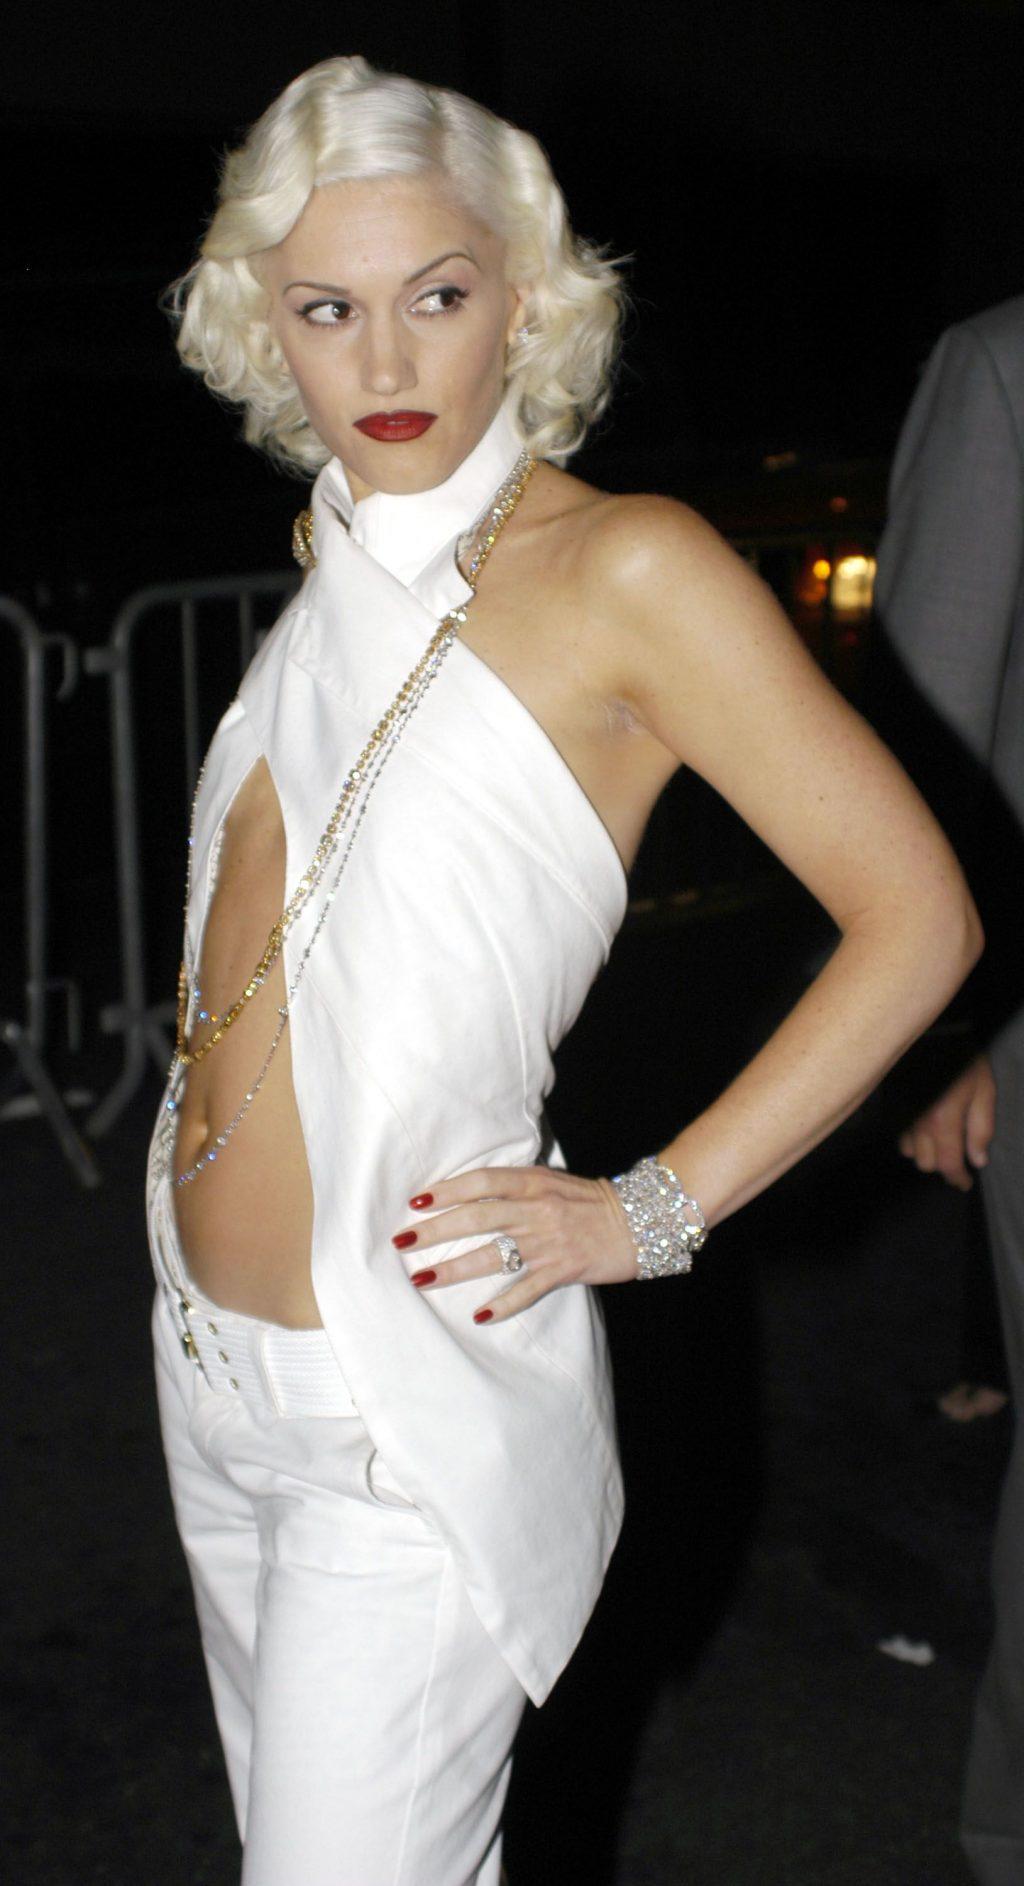 Thời trang thảm đỏ Grammy Gwen Stefani